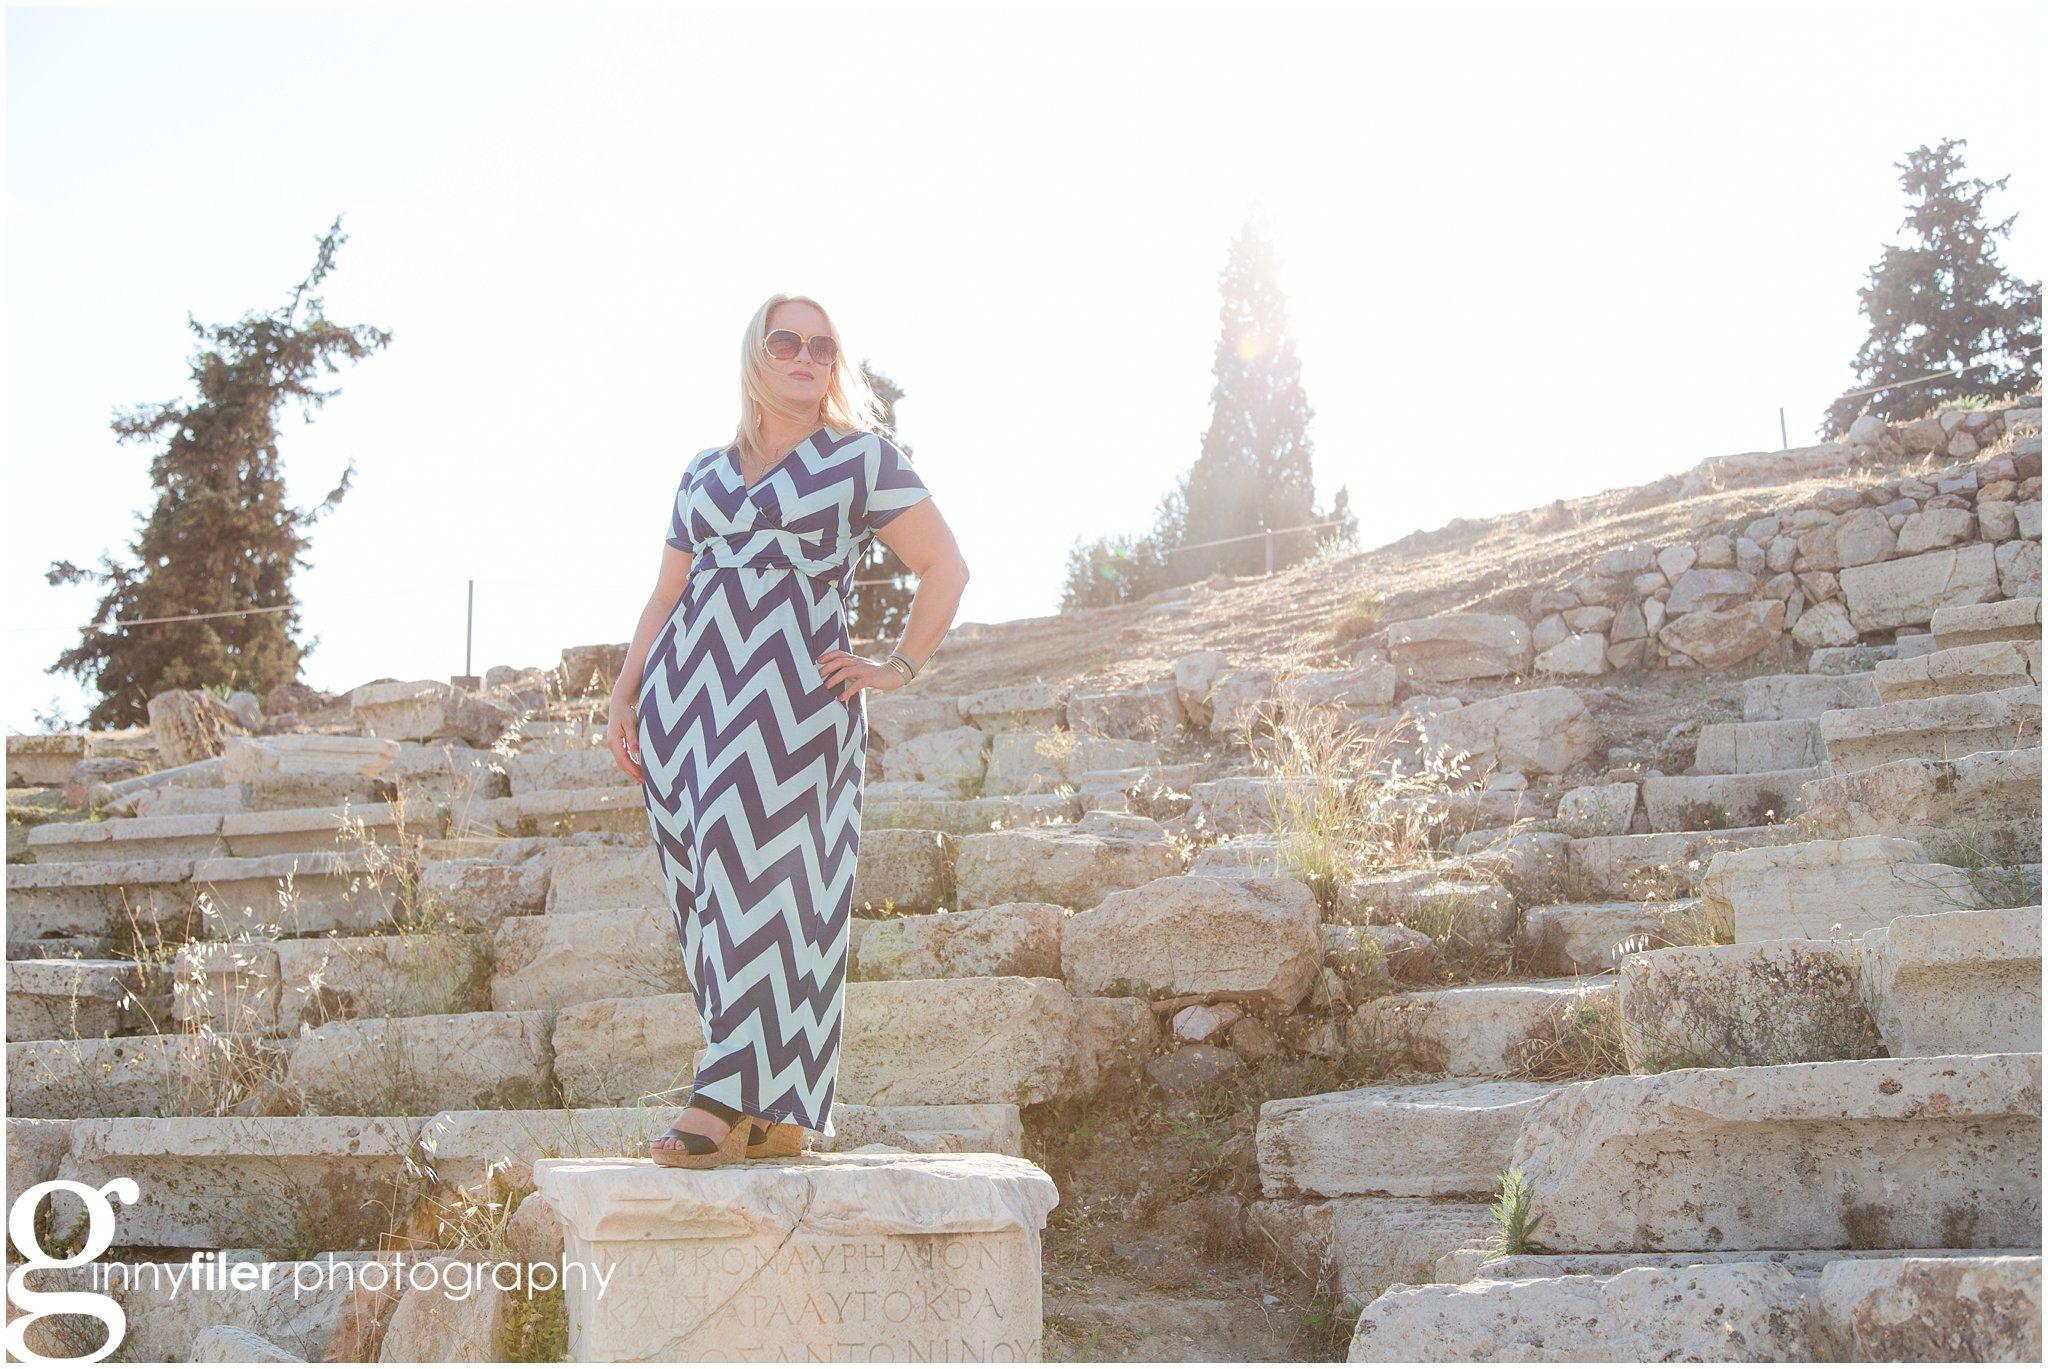 Greece_vacation_0024a.jpg